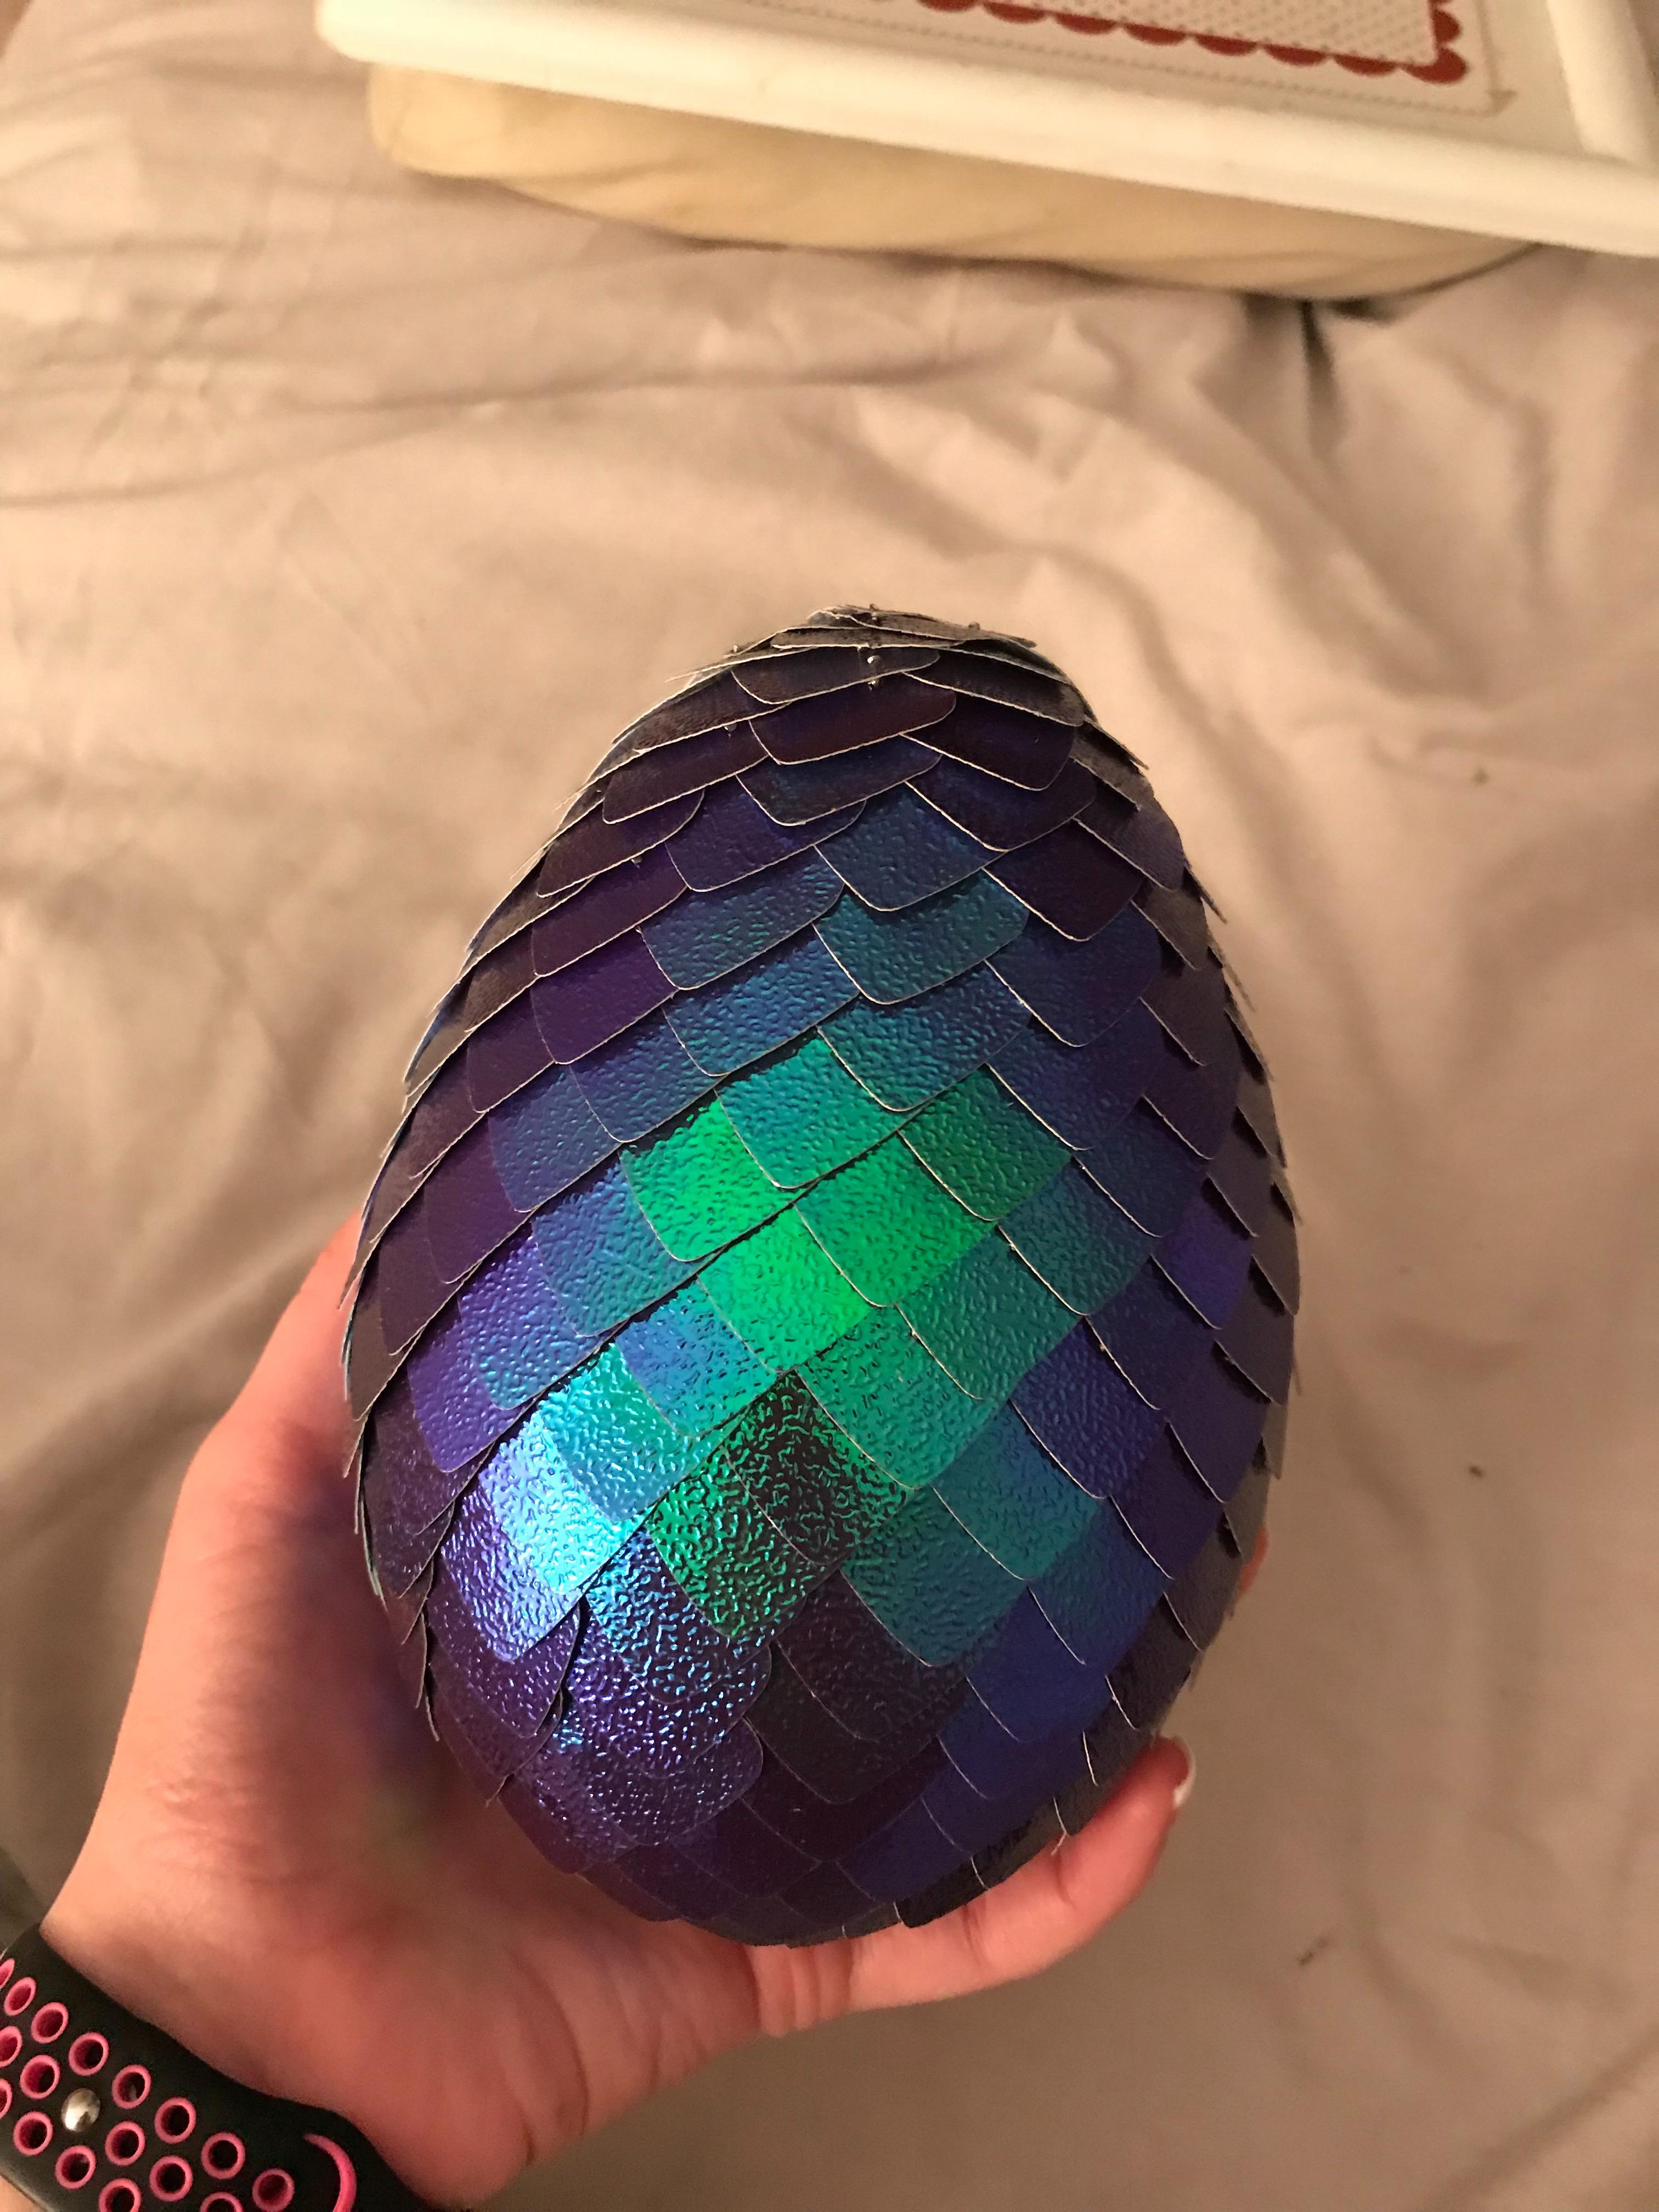 Picture of Dragon Egg, GOT, Daenerys Egg, Harry Potter